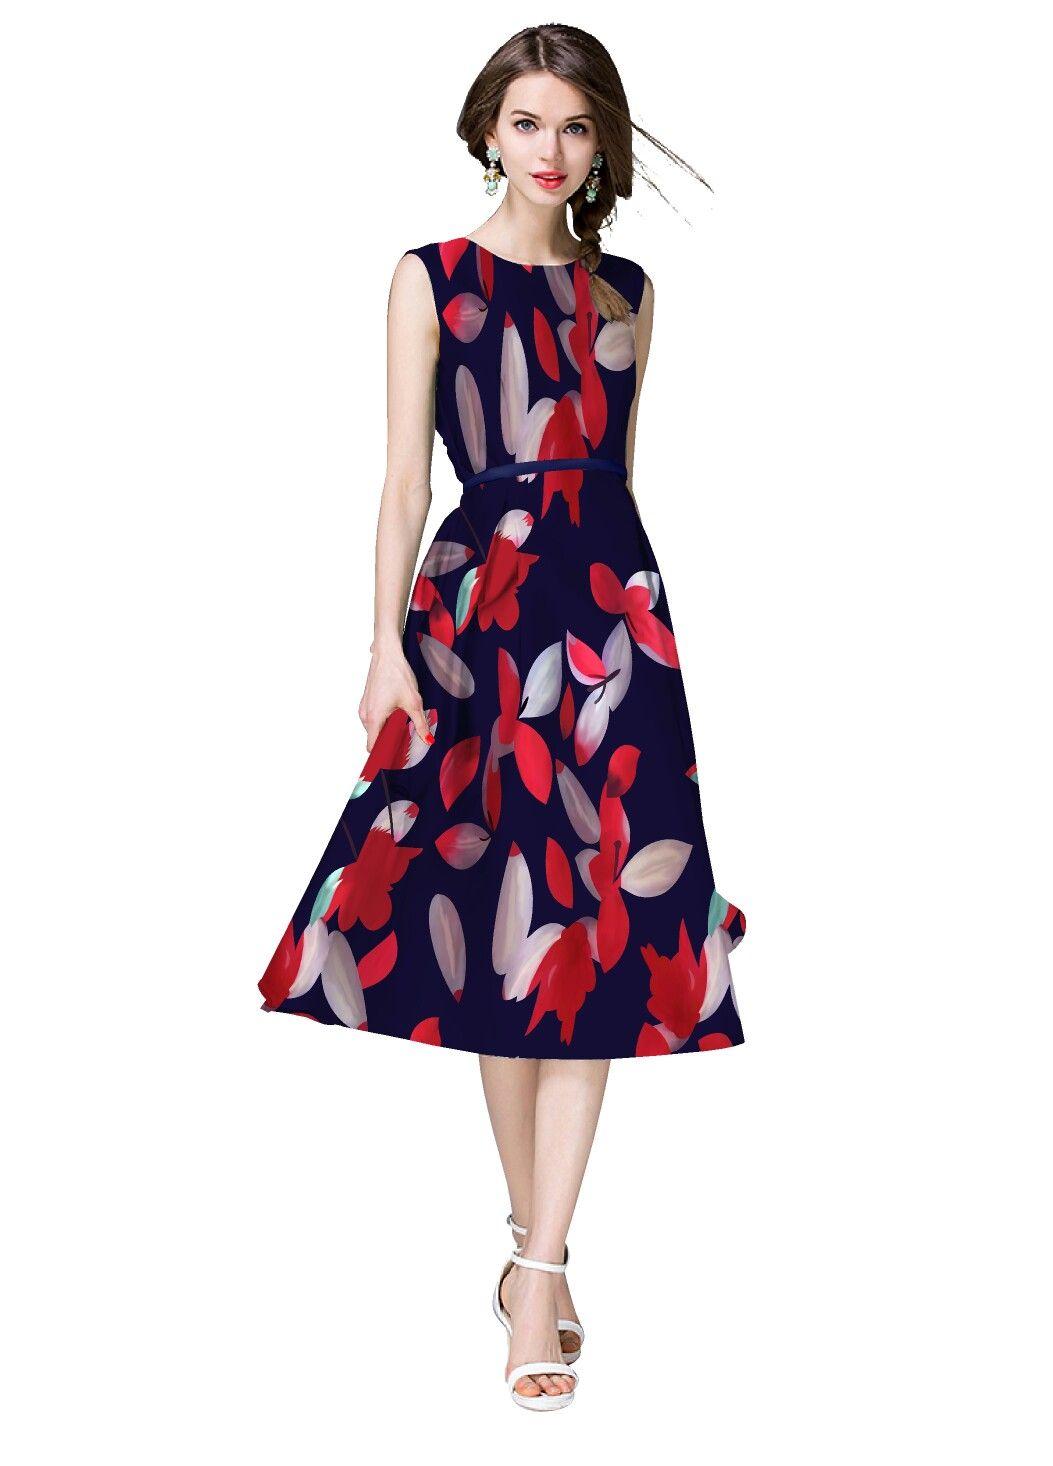 0b897d03e2cb Sirene Fashion Premium Satin Western Dress. Price  850INR Size  S